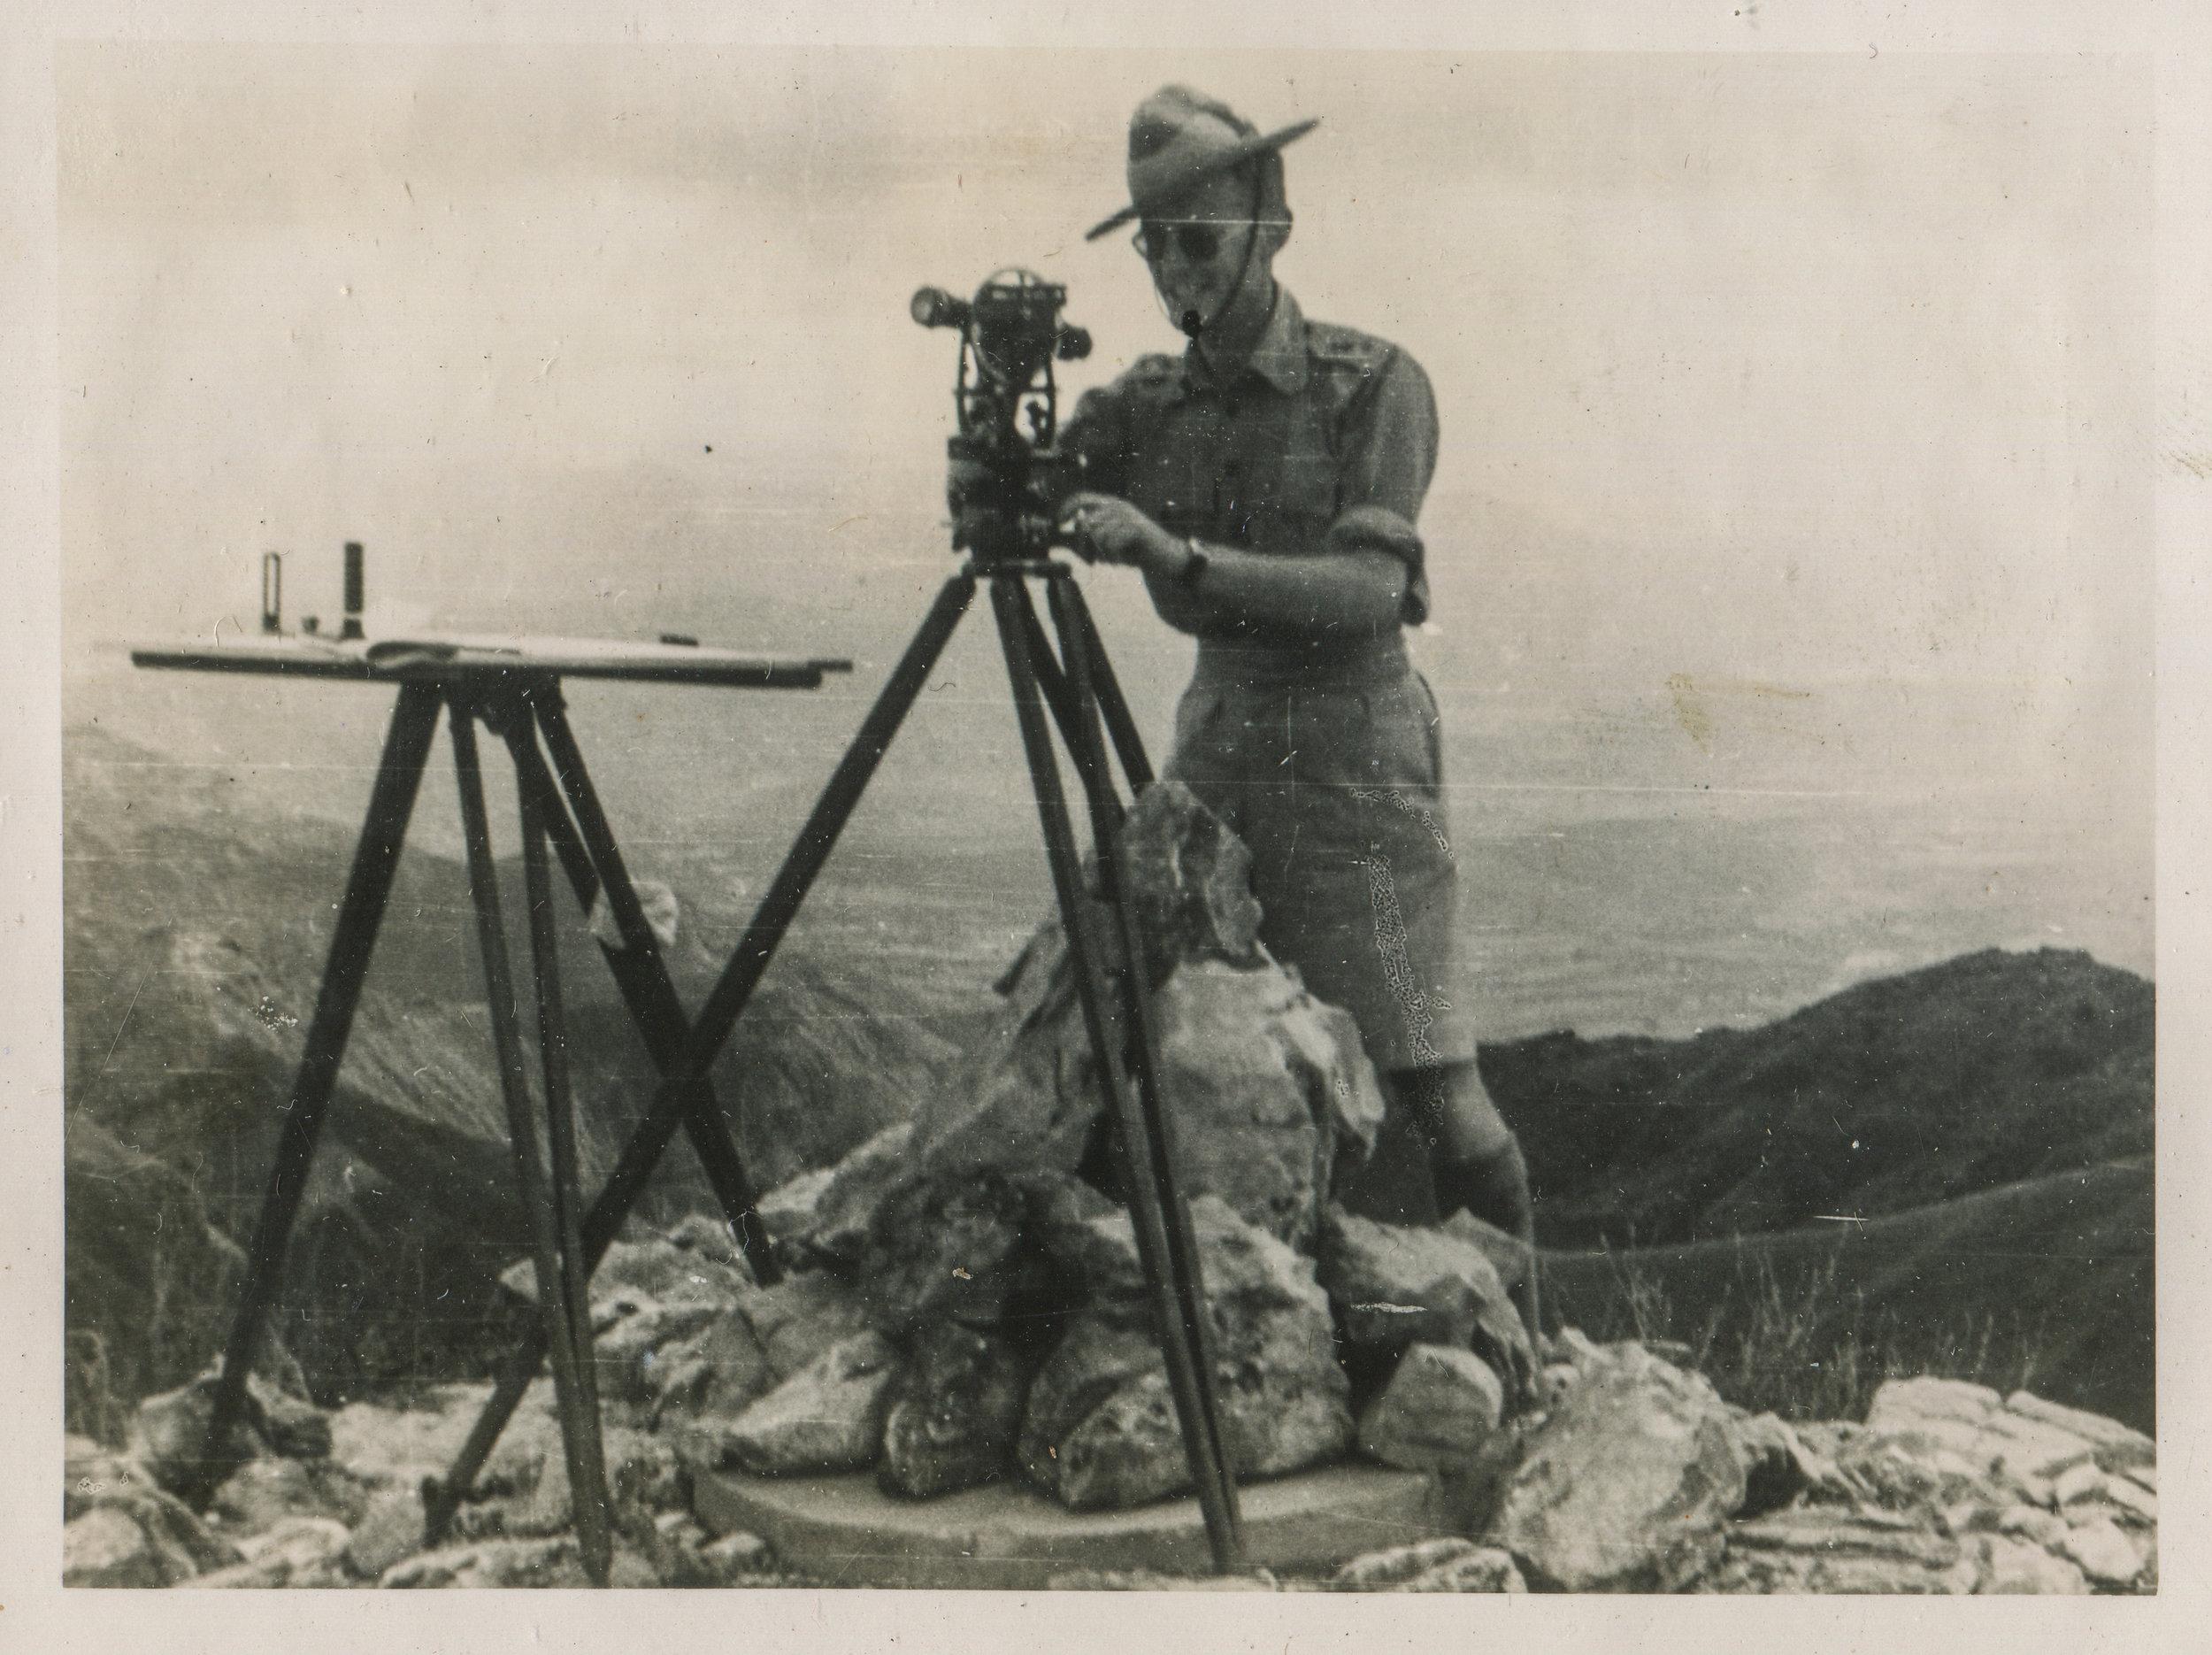 HARRY BIRRELL: FILMS OF LOVE AND WAR